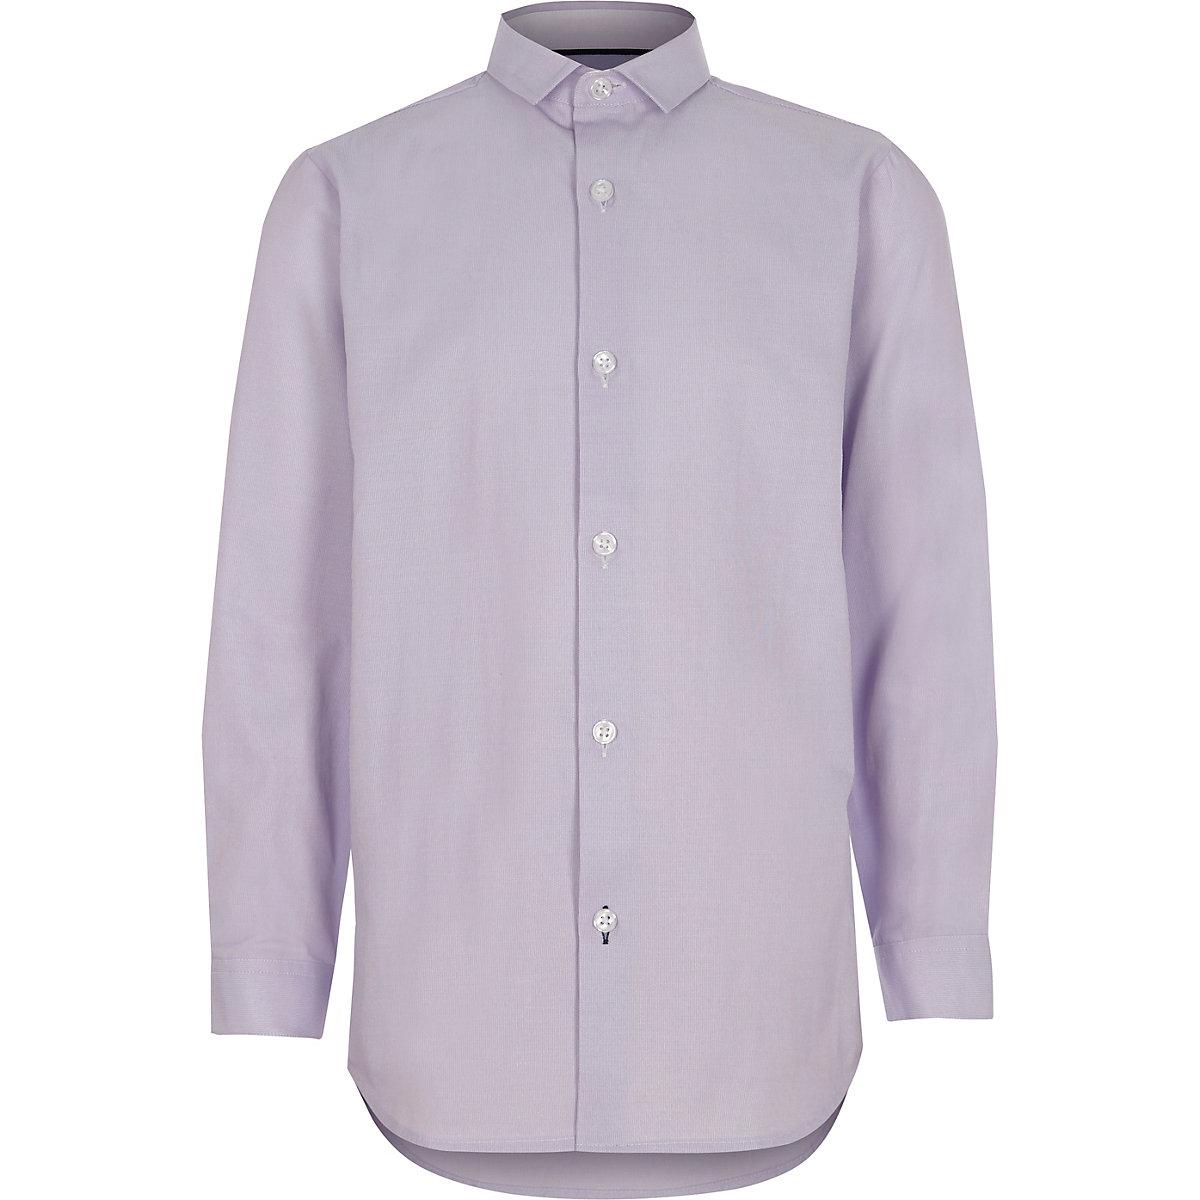 Boys light purple smart shirt